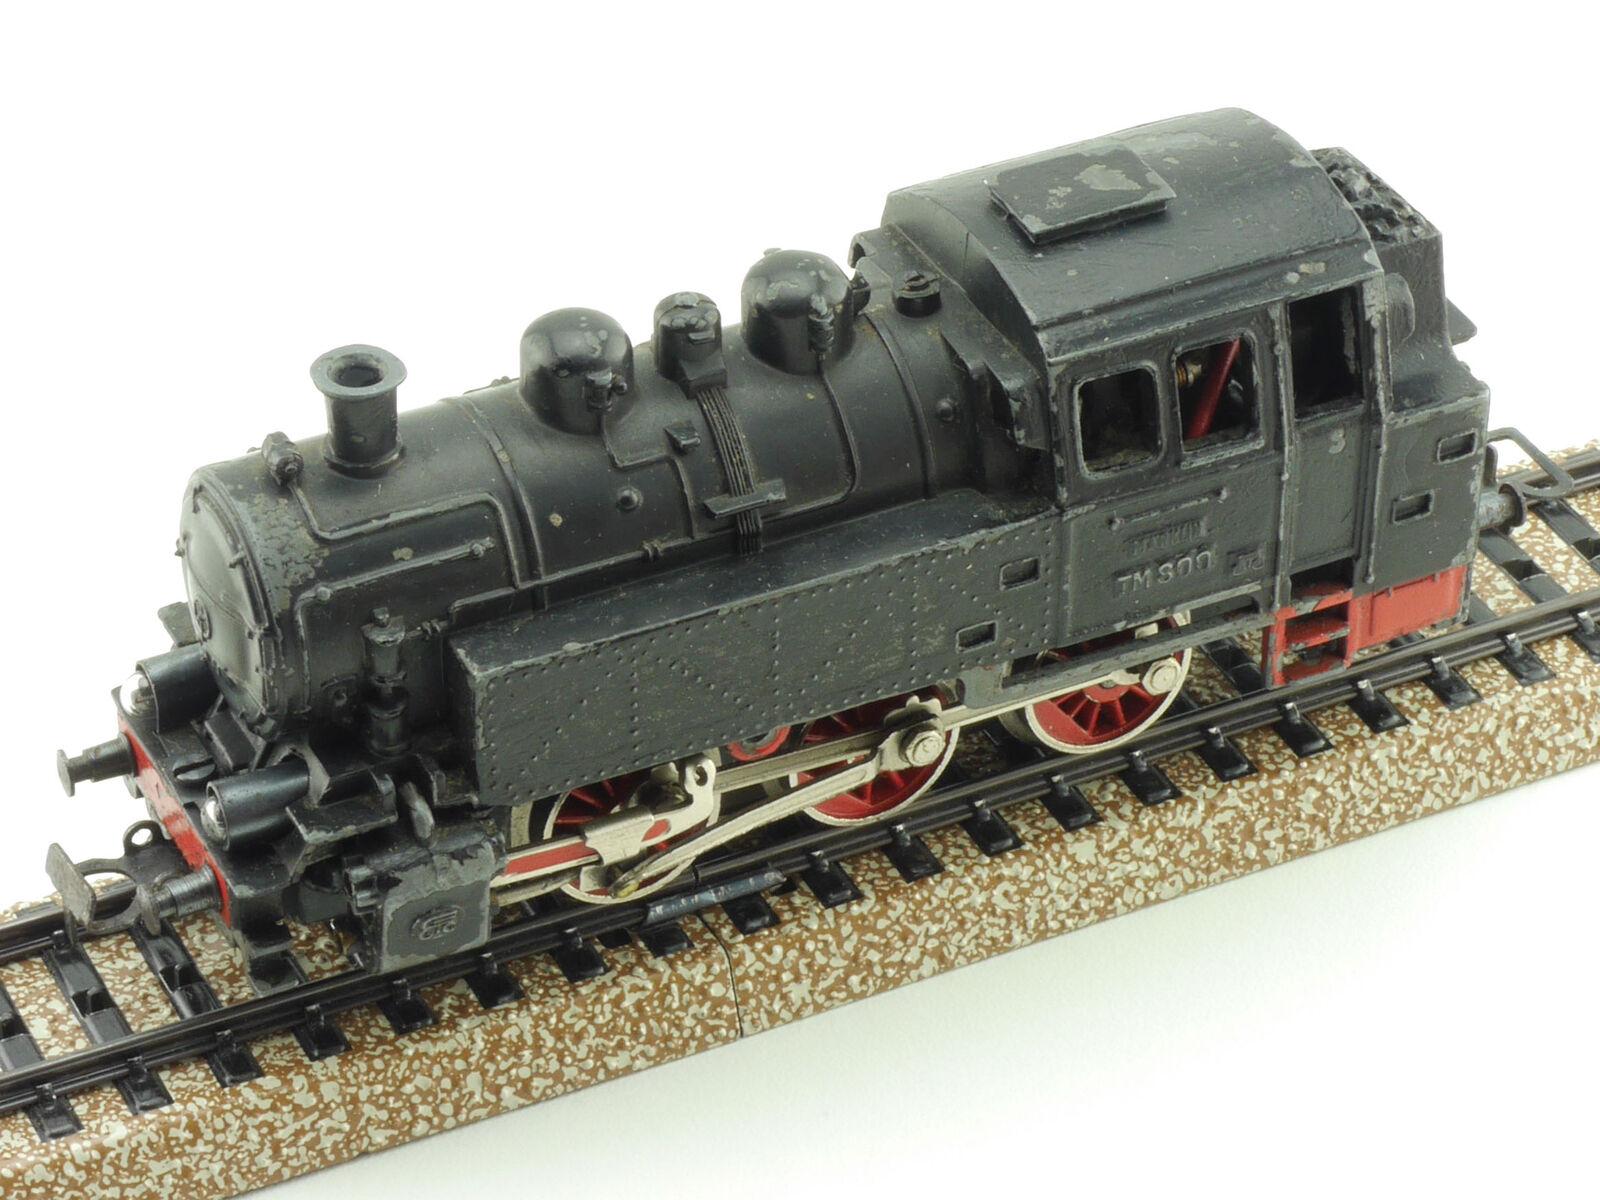 Märklin TM 800.2 Tenderlok Dampflok BR 80 3004 ohne Karton 1603-26-07